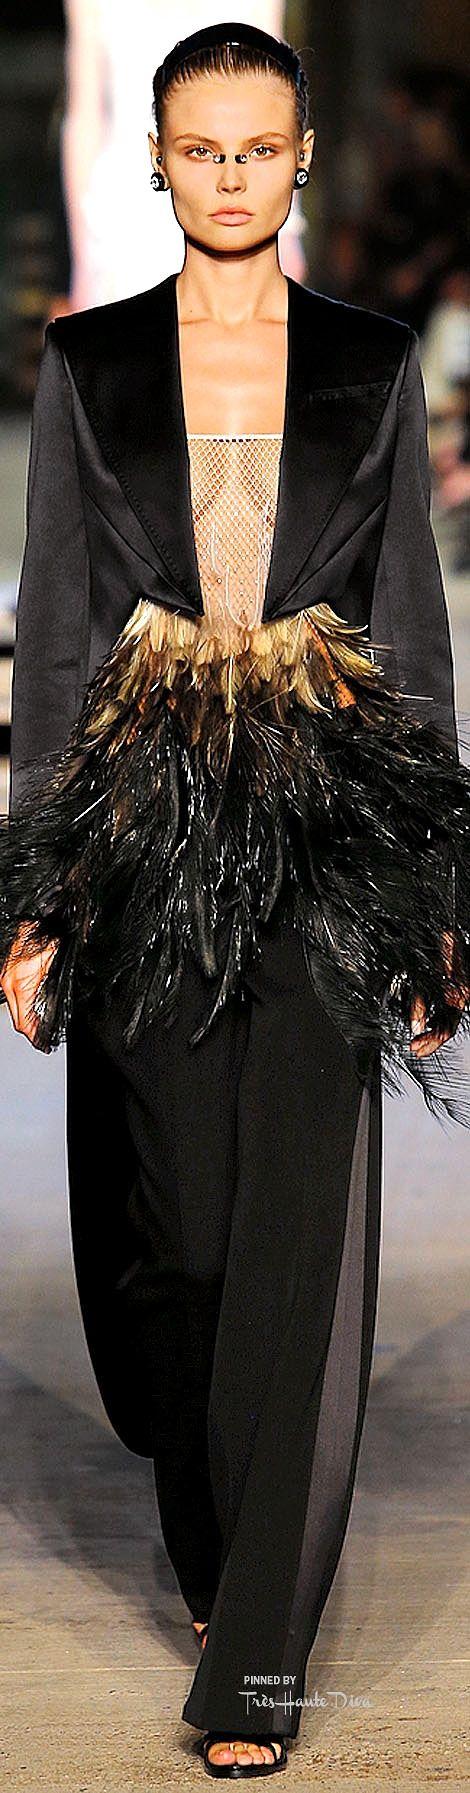 Givenchy Spring 2016 RTW ♔ Très Haute Diva ♔  For more fashion visit my website at http://www.treshautediva.com/